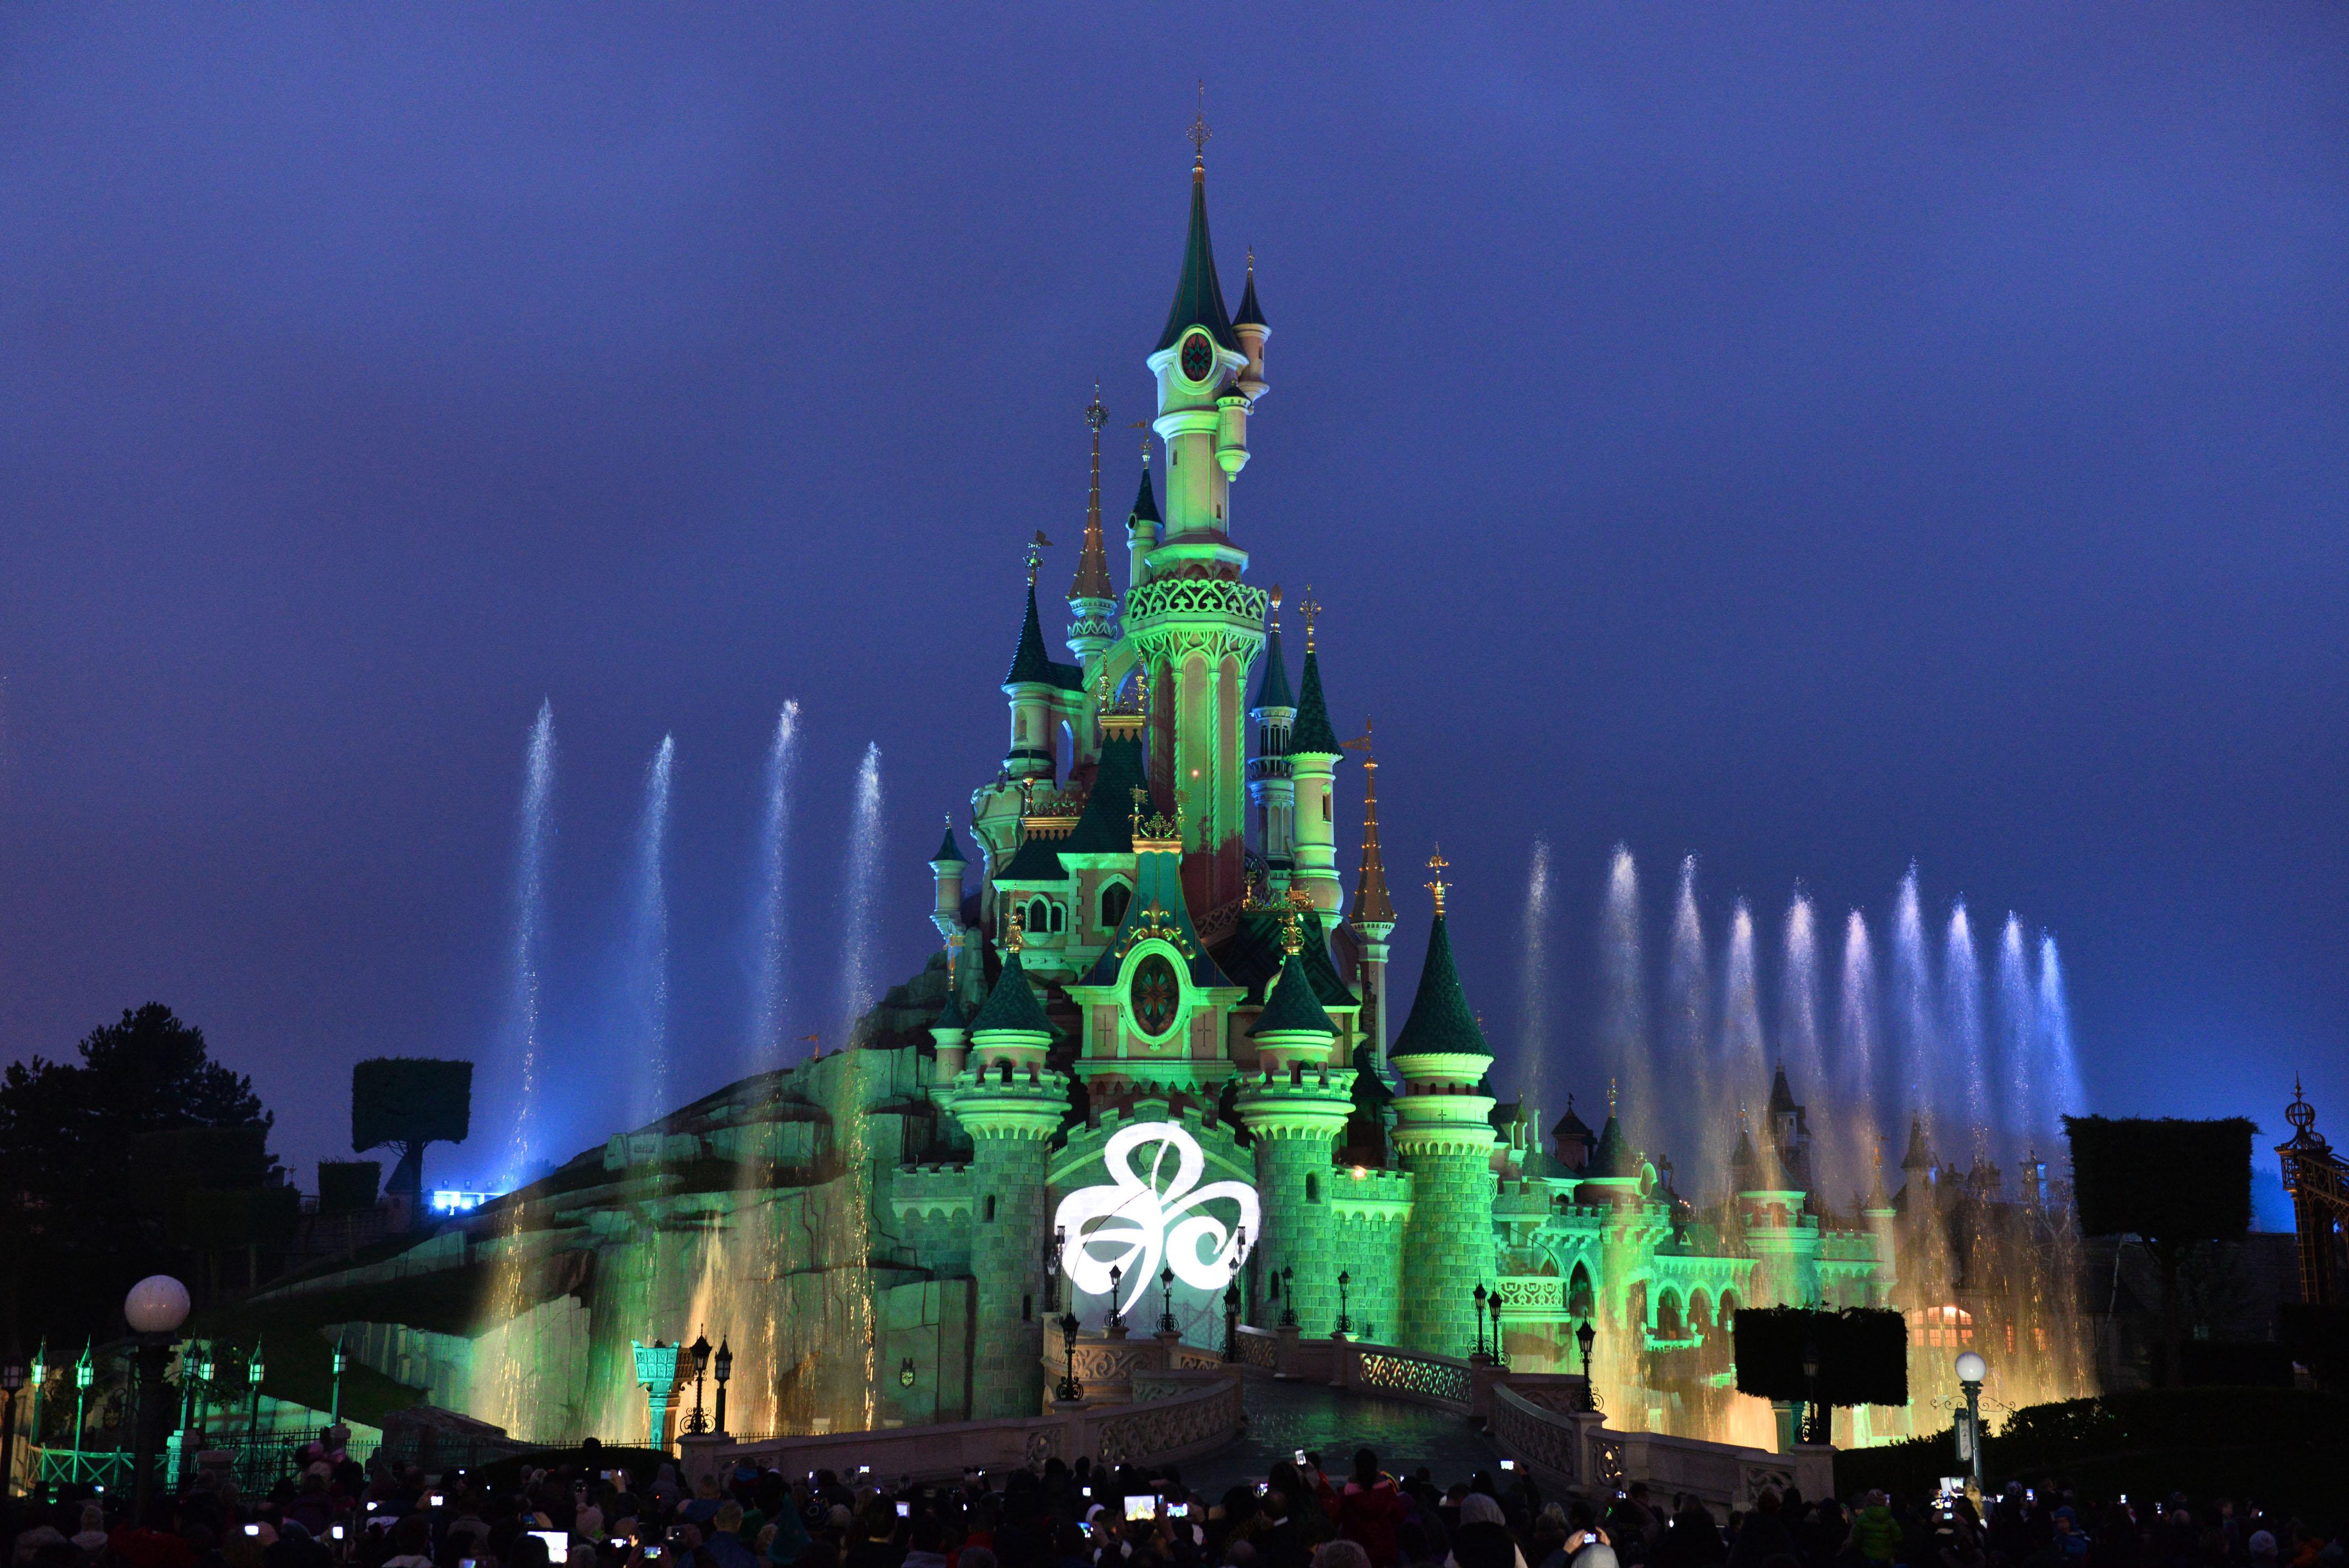 SLEEPING BEAUTY'S CASTLE AT DISNEYLAND® PARIS JOINS TOURISM I